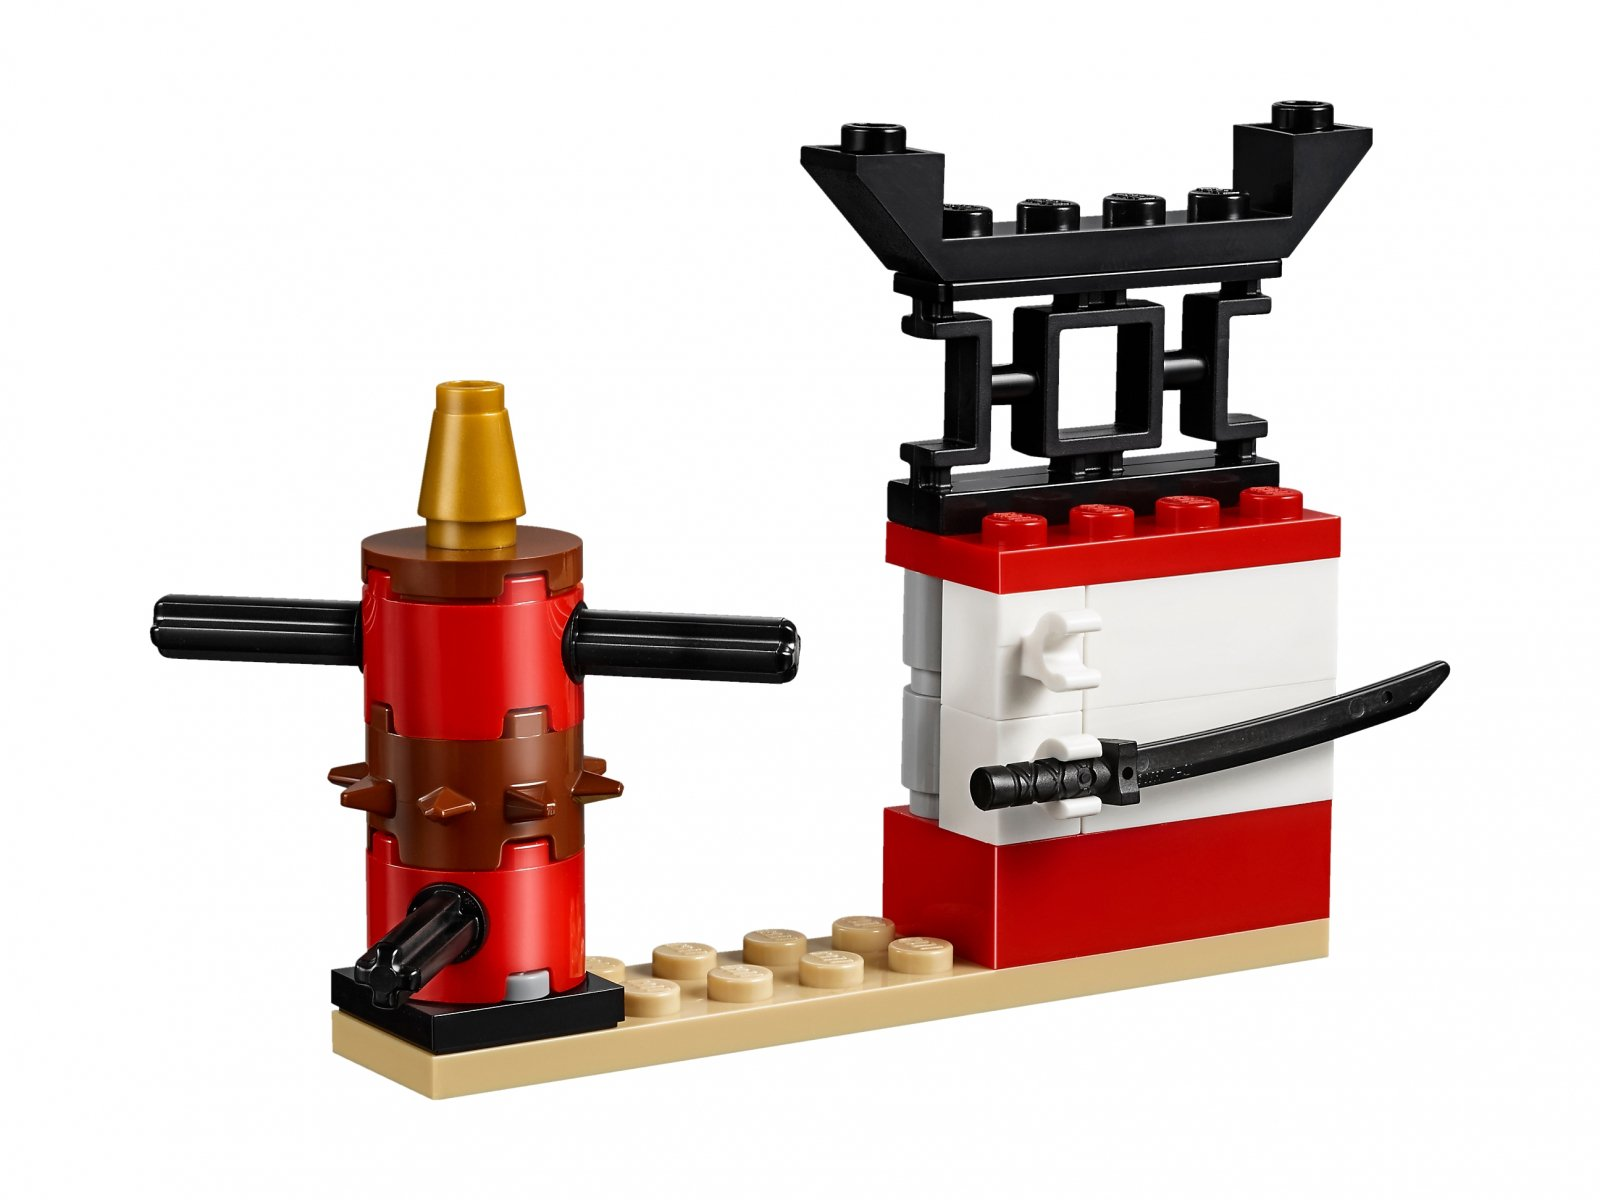 LEGO Juniors 10739 Atak rekinów